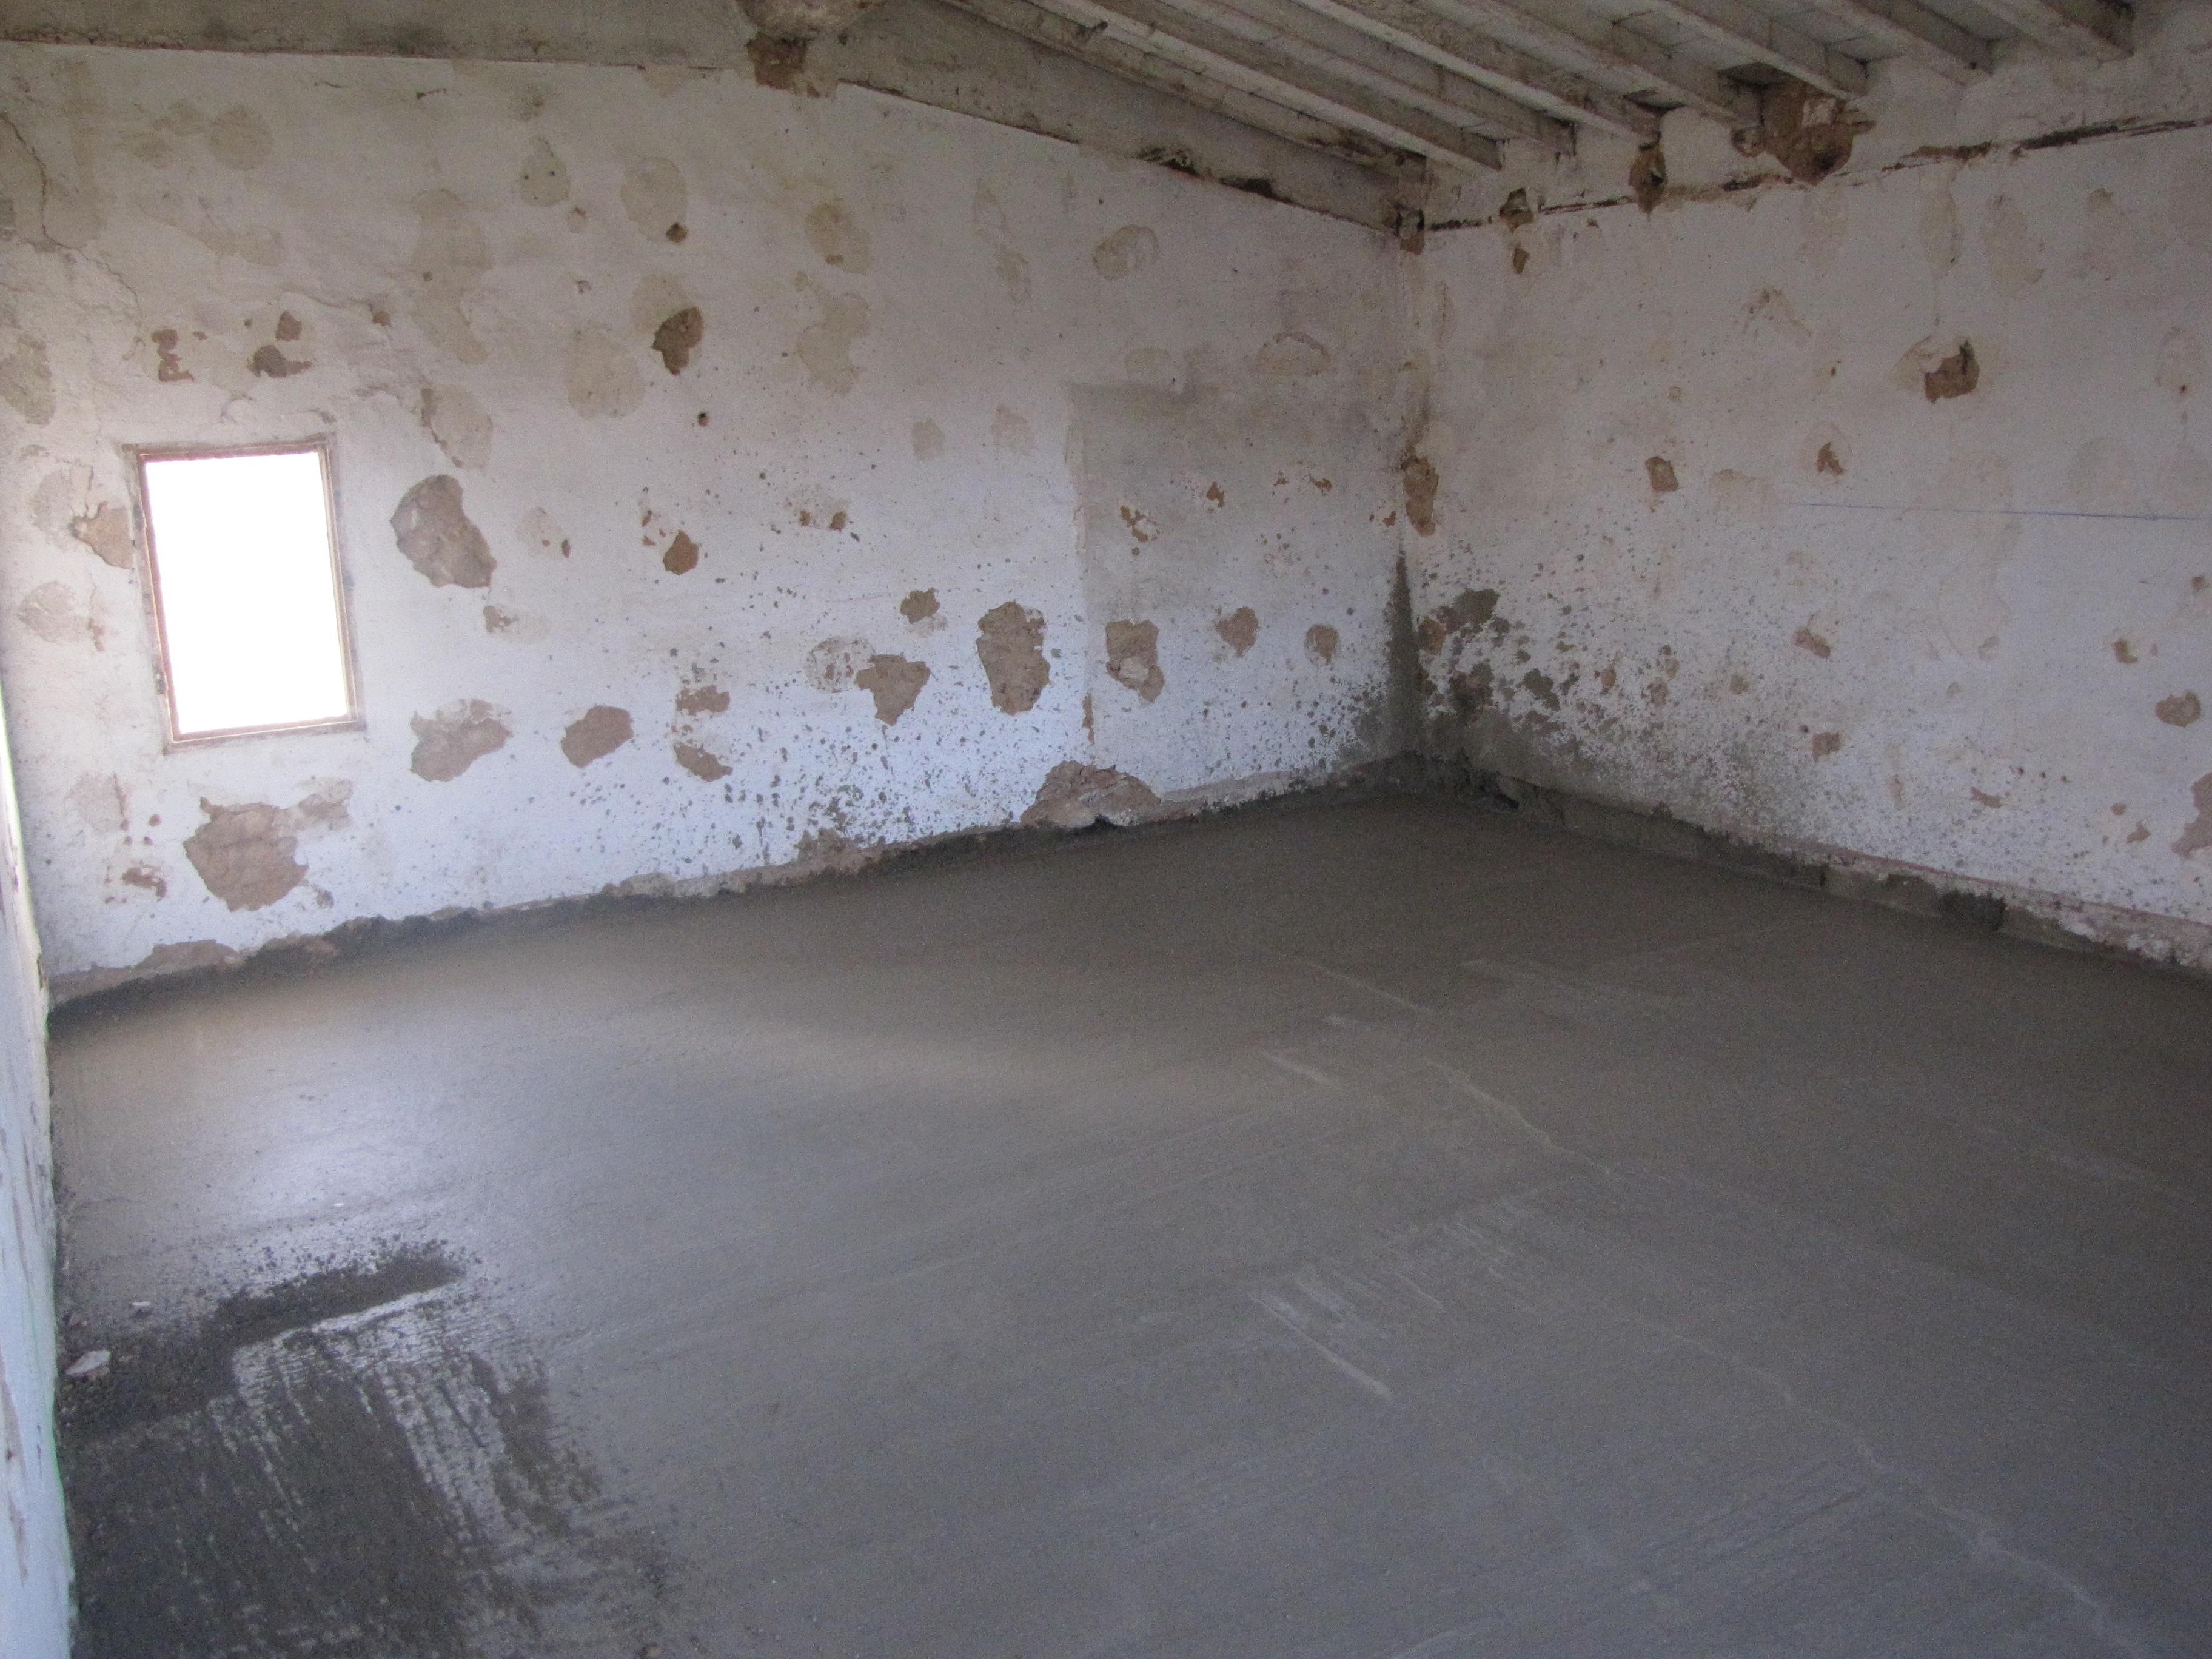 dalles plancher desportes r novation aubais sommi res h rault gard. Black Bedroom Furniture Sets. Home Design Ideas